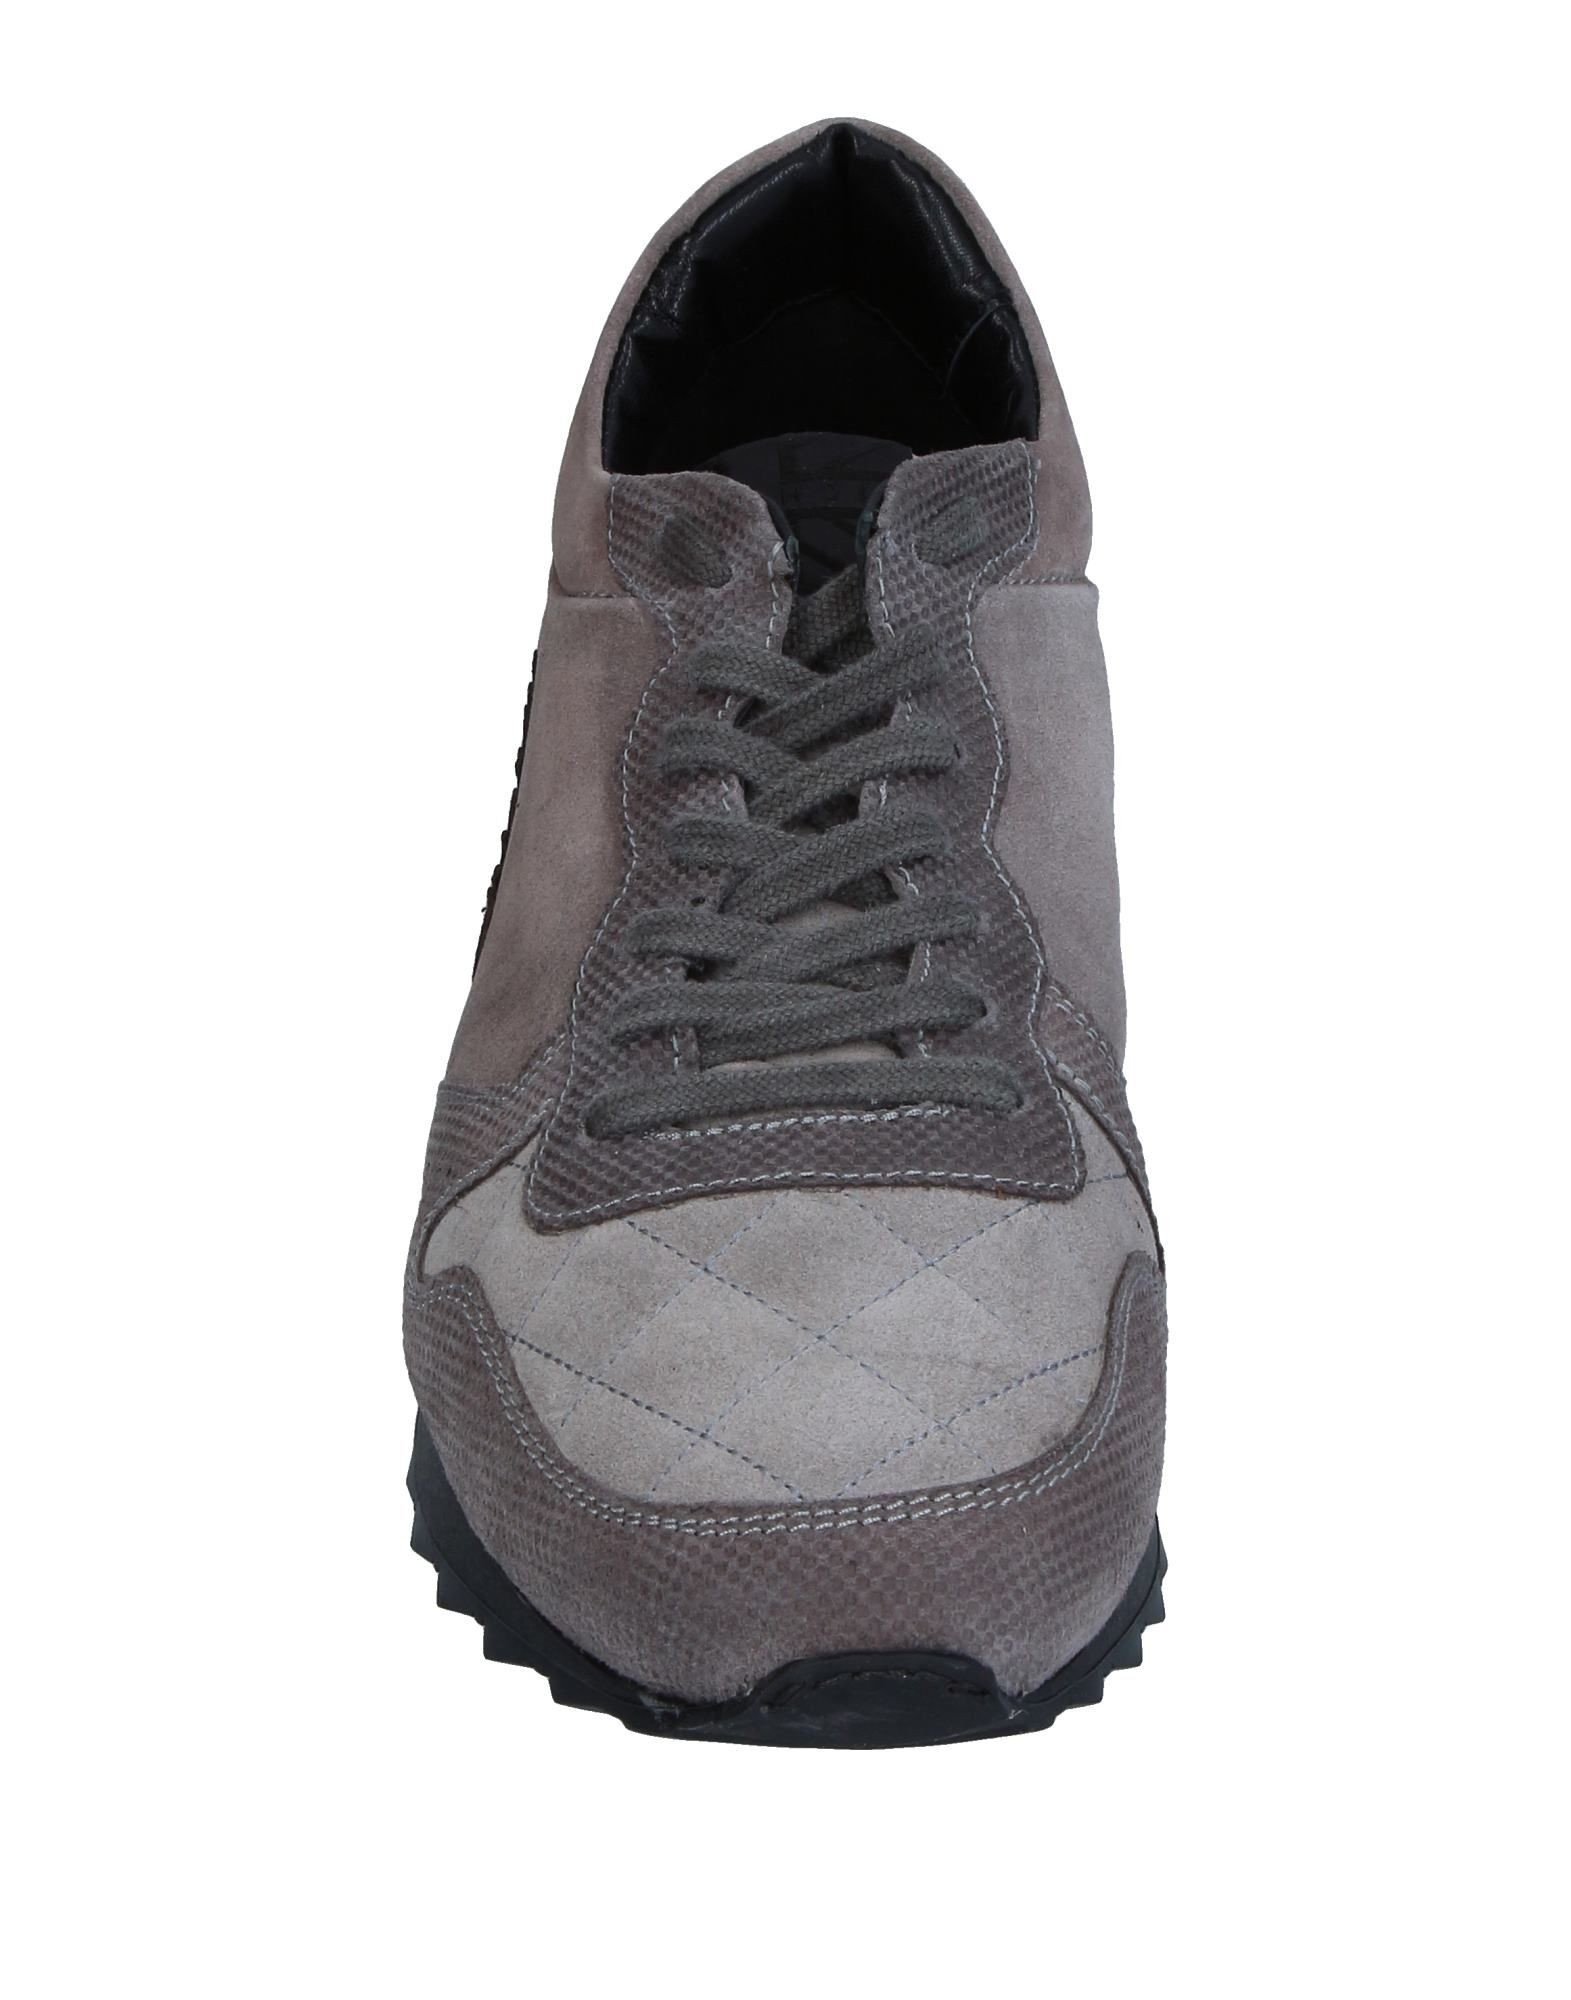 Haltbare Mode billige Schuhe Richmond Sneakers Herren  11345297KL Heiße Schuhe